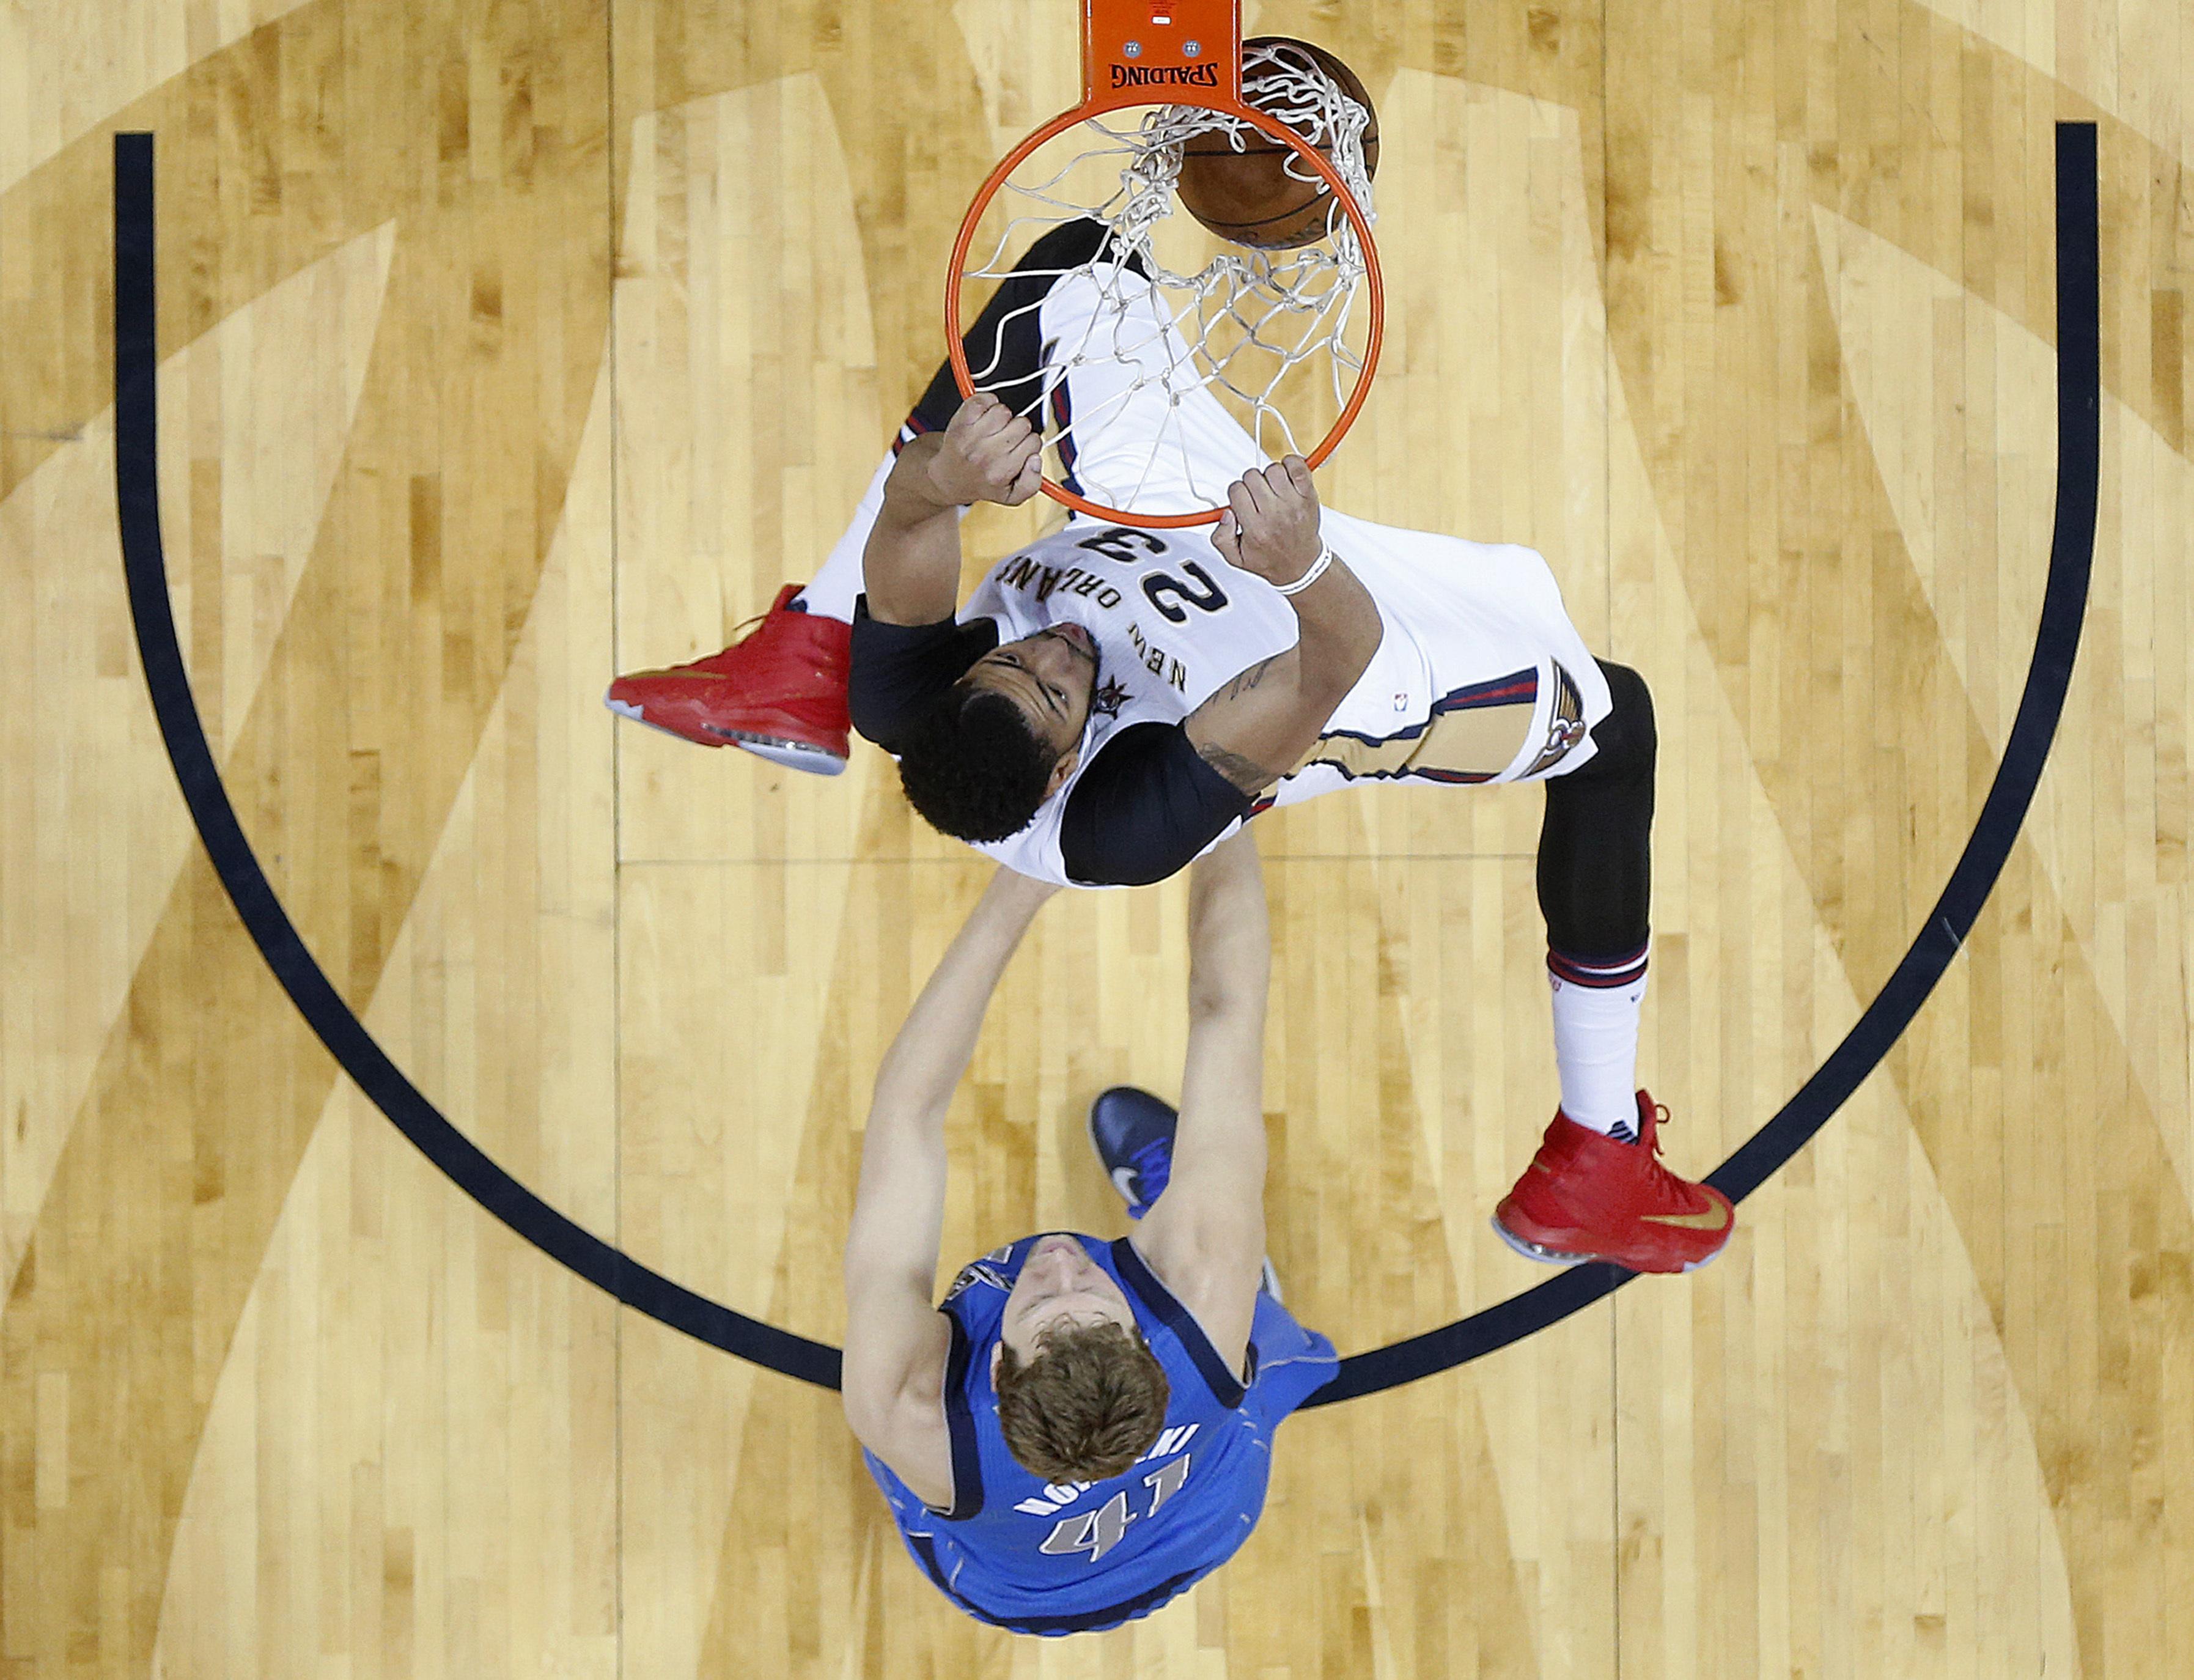 Mavericks_pelicans_basketball_33894